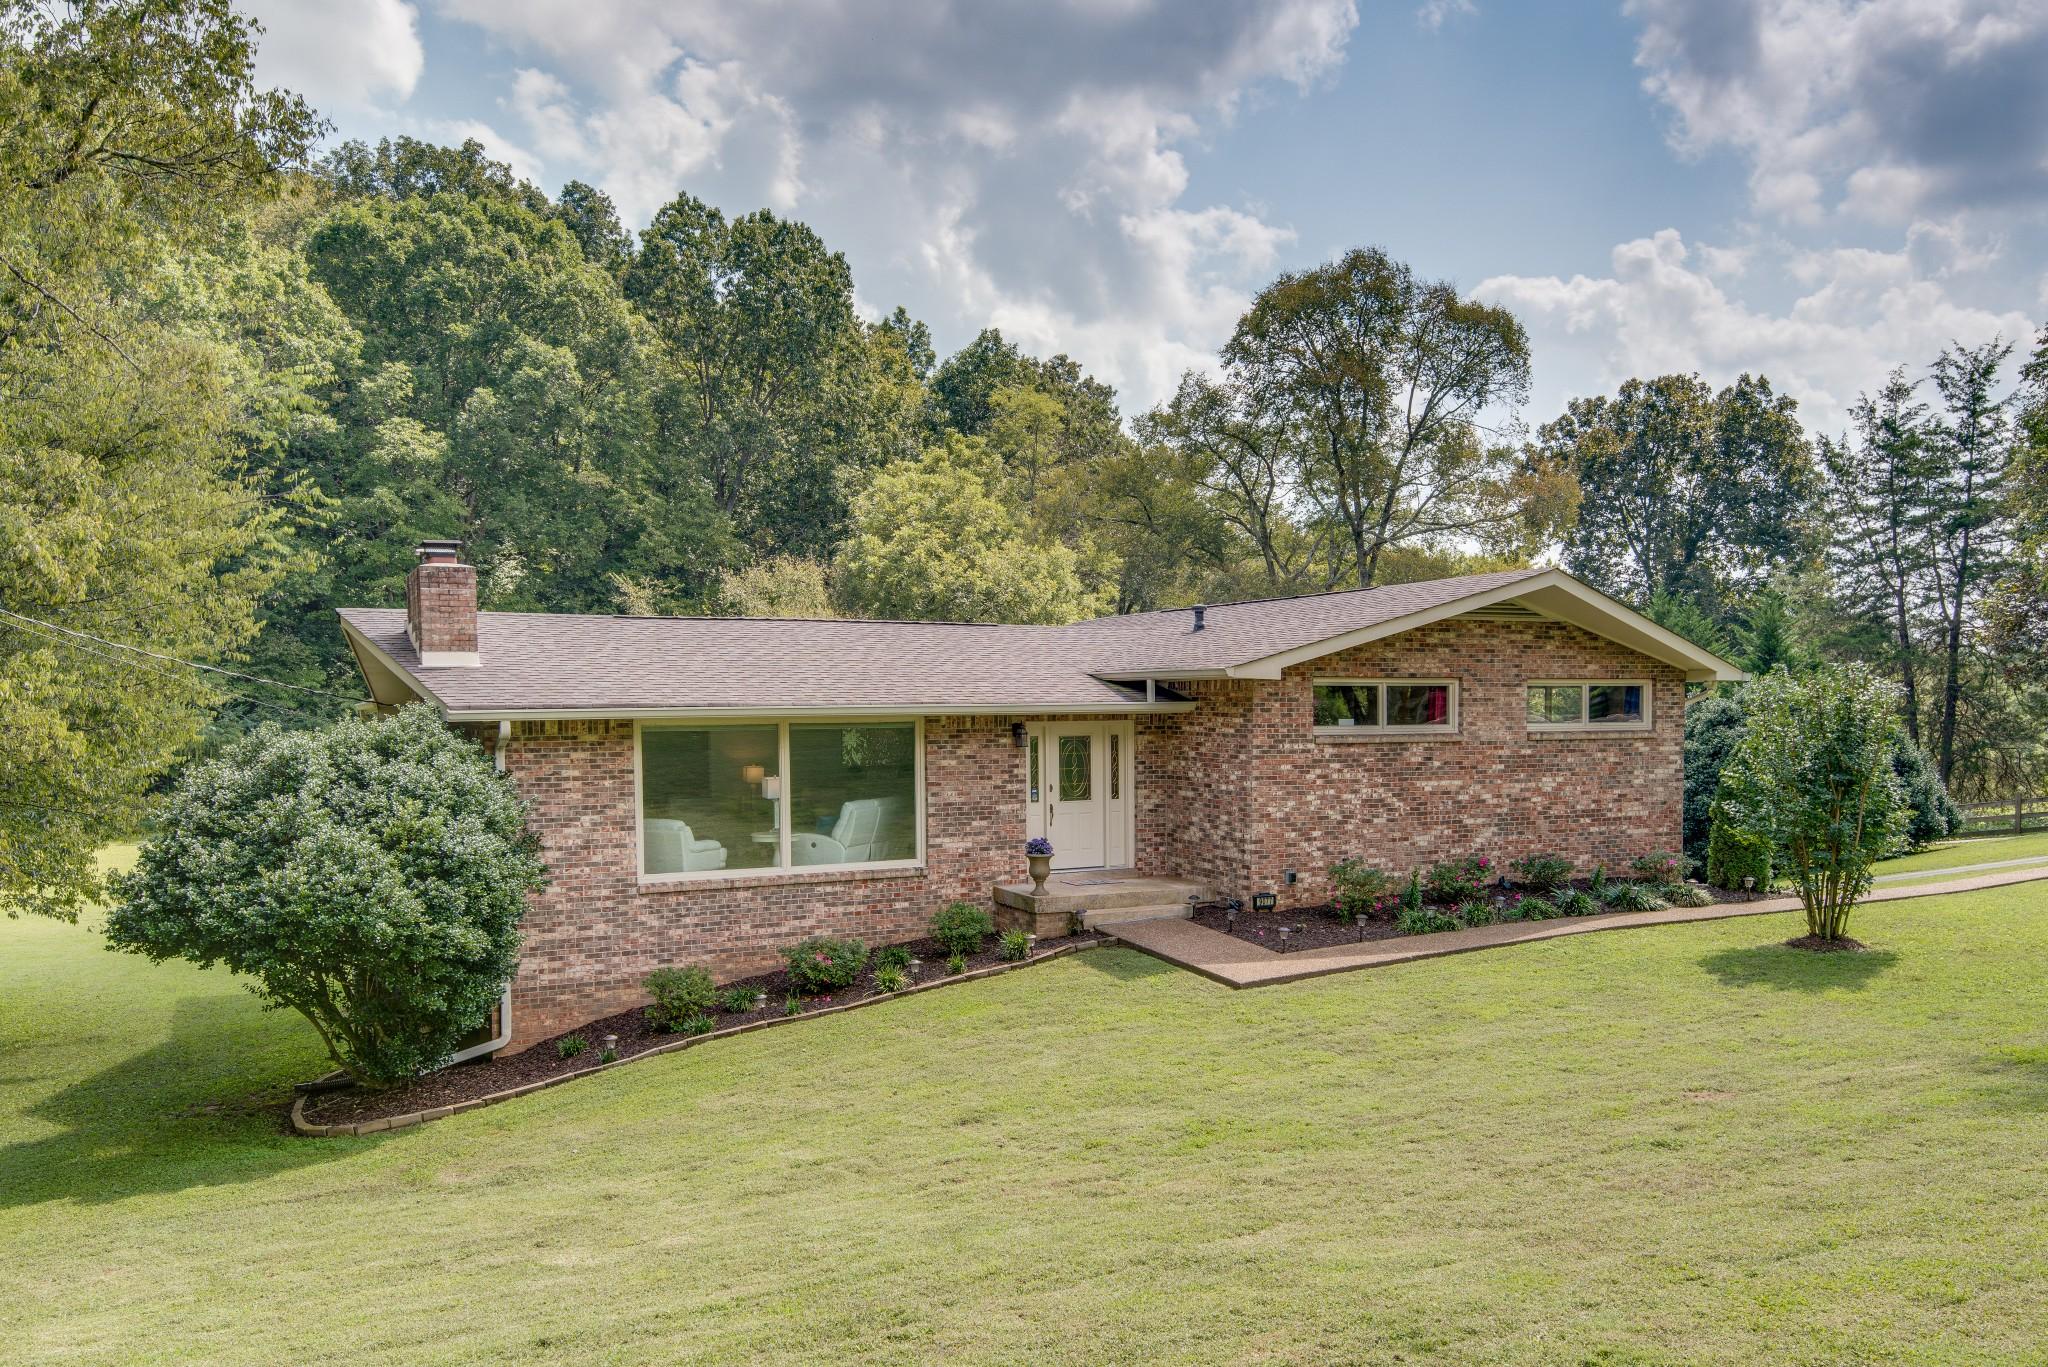 9077 Old Charlotte Pike, Pegram, TN 37143 - Pegram, TN real estate listing